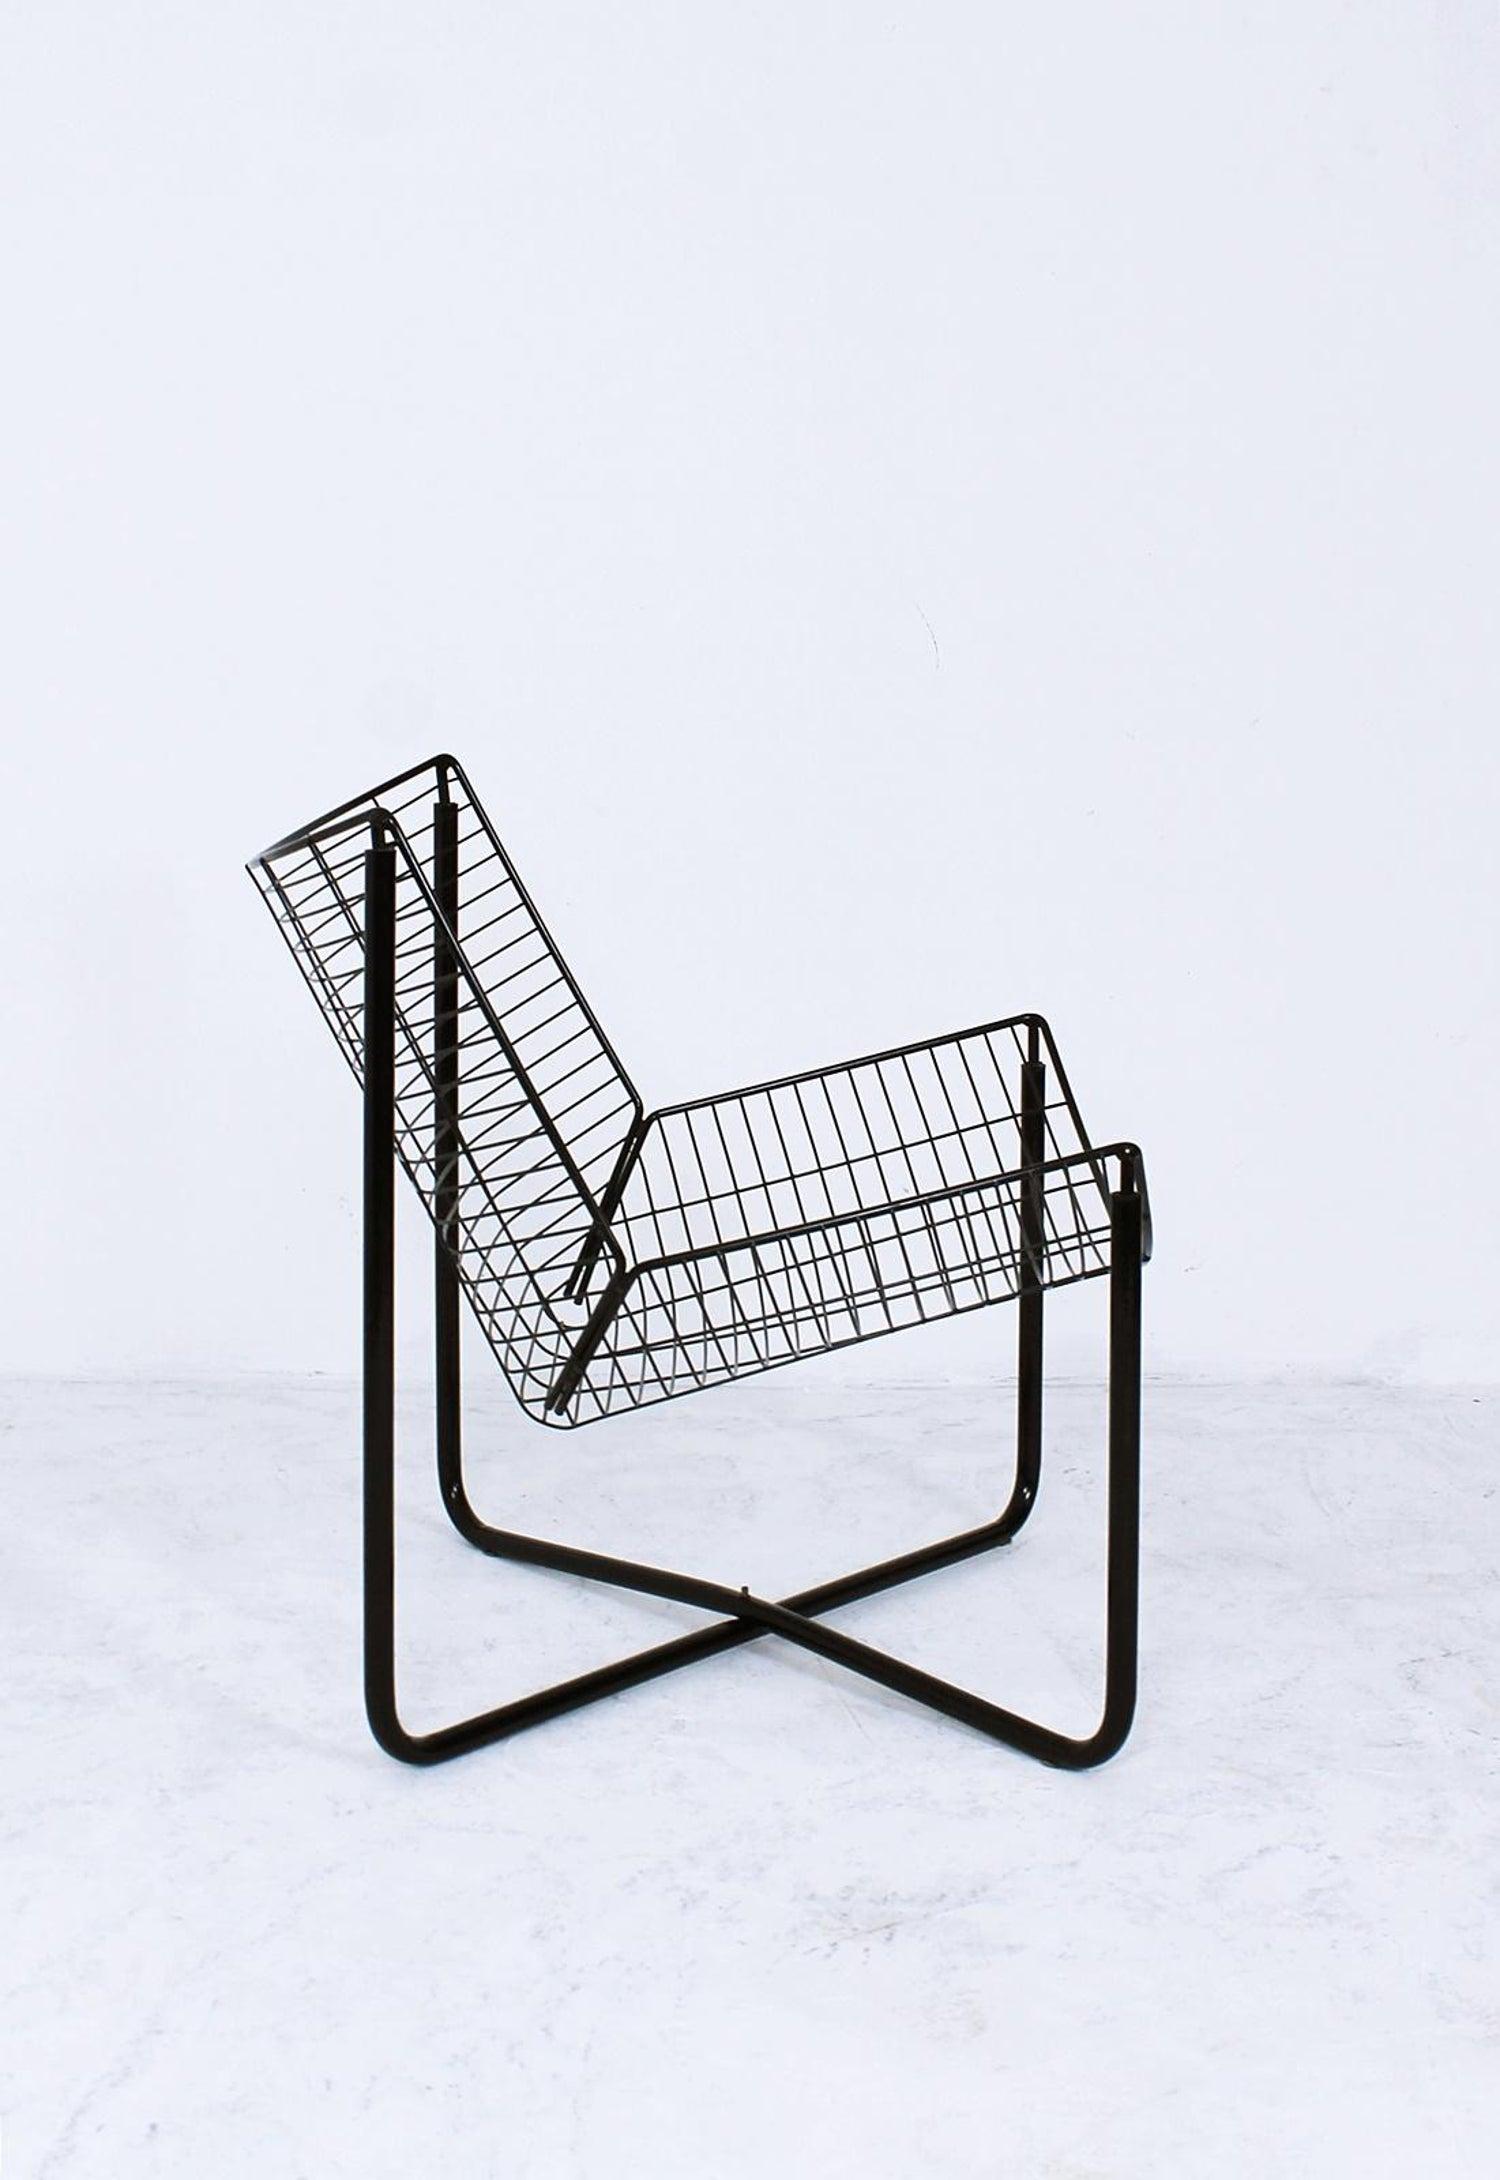 Ikea1983 Niels Jarpen Lounge Chair For Wire Gammelgaard By MGLSjUzpqV